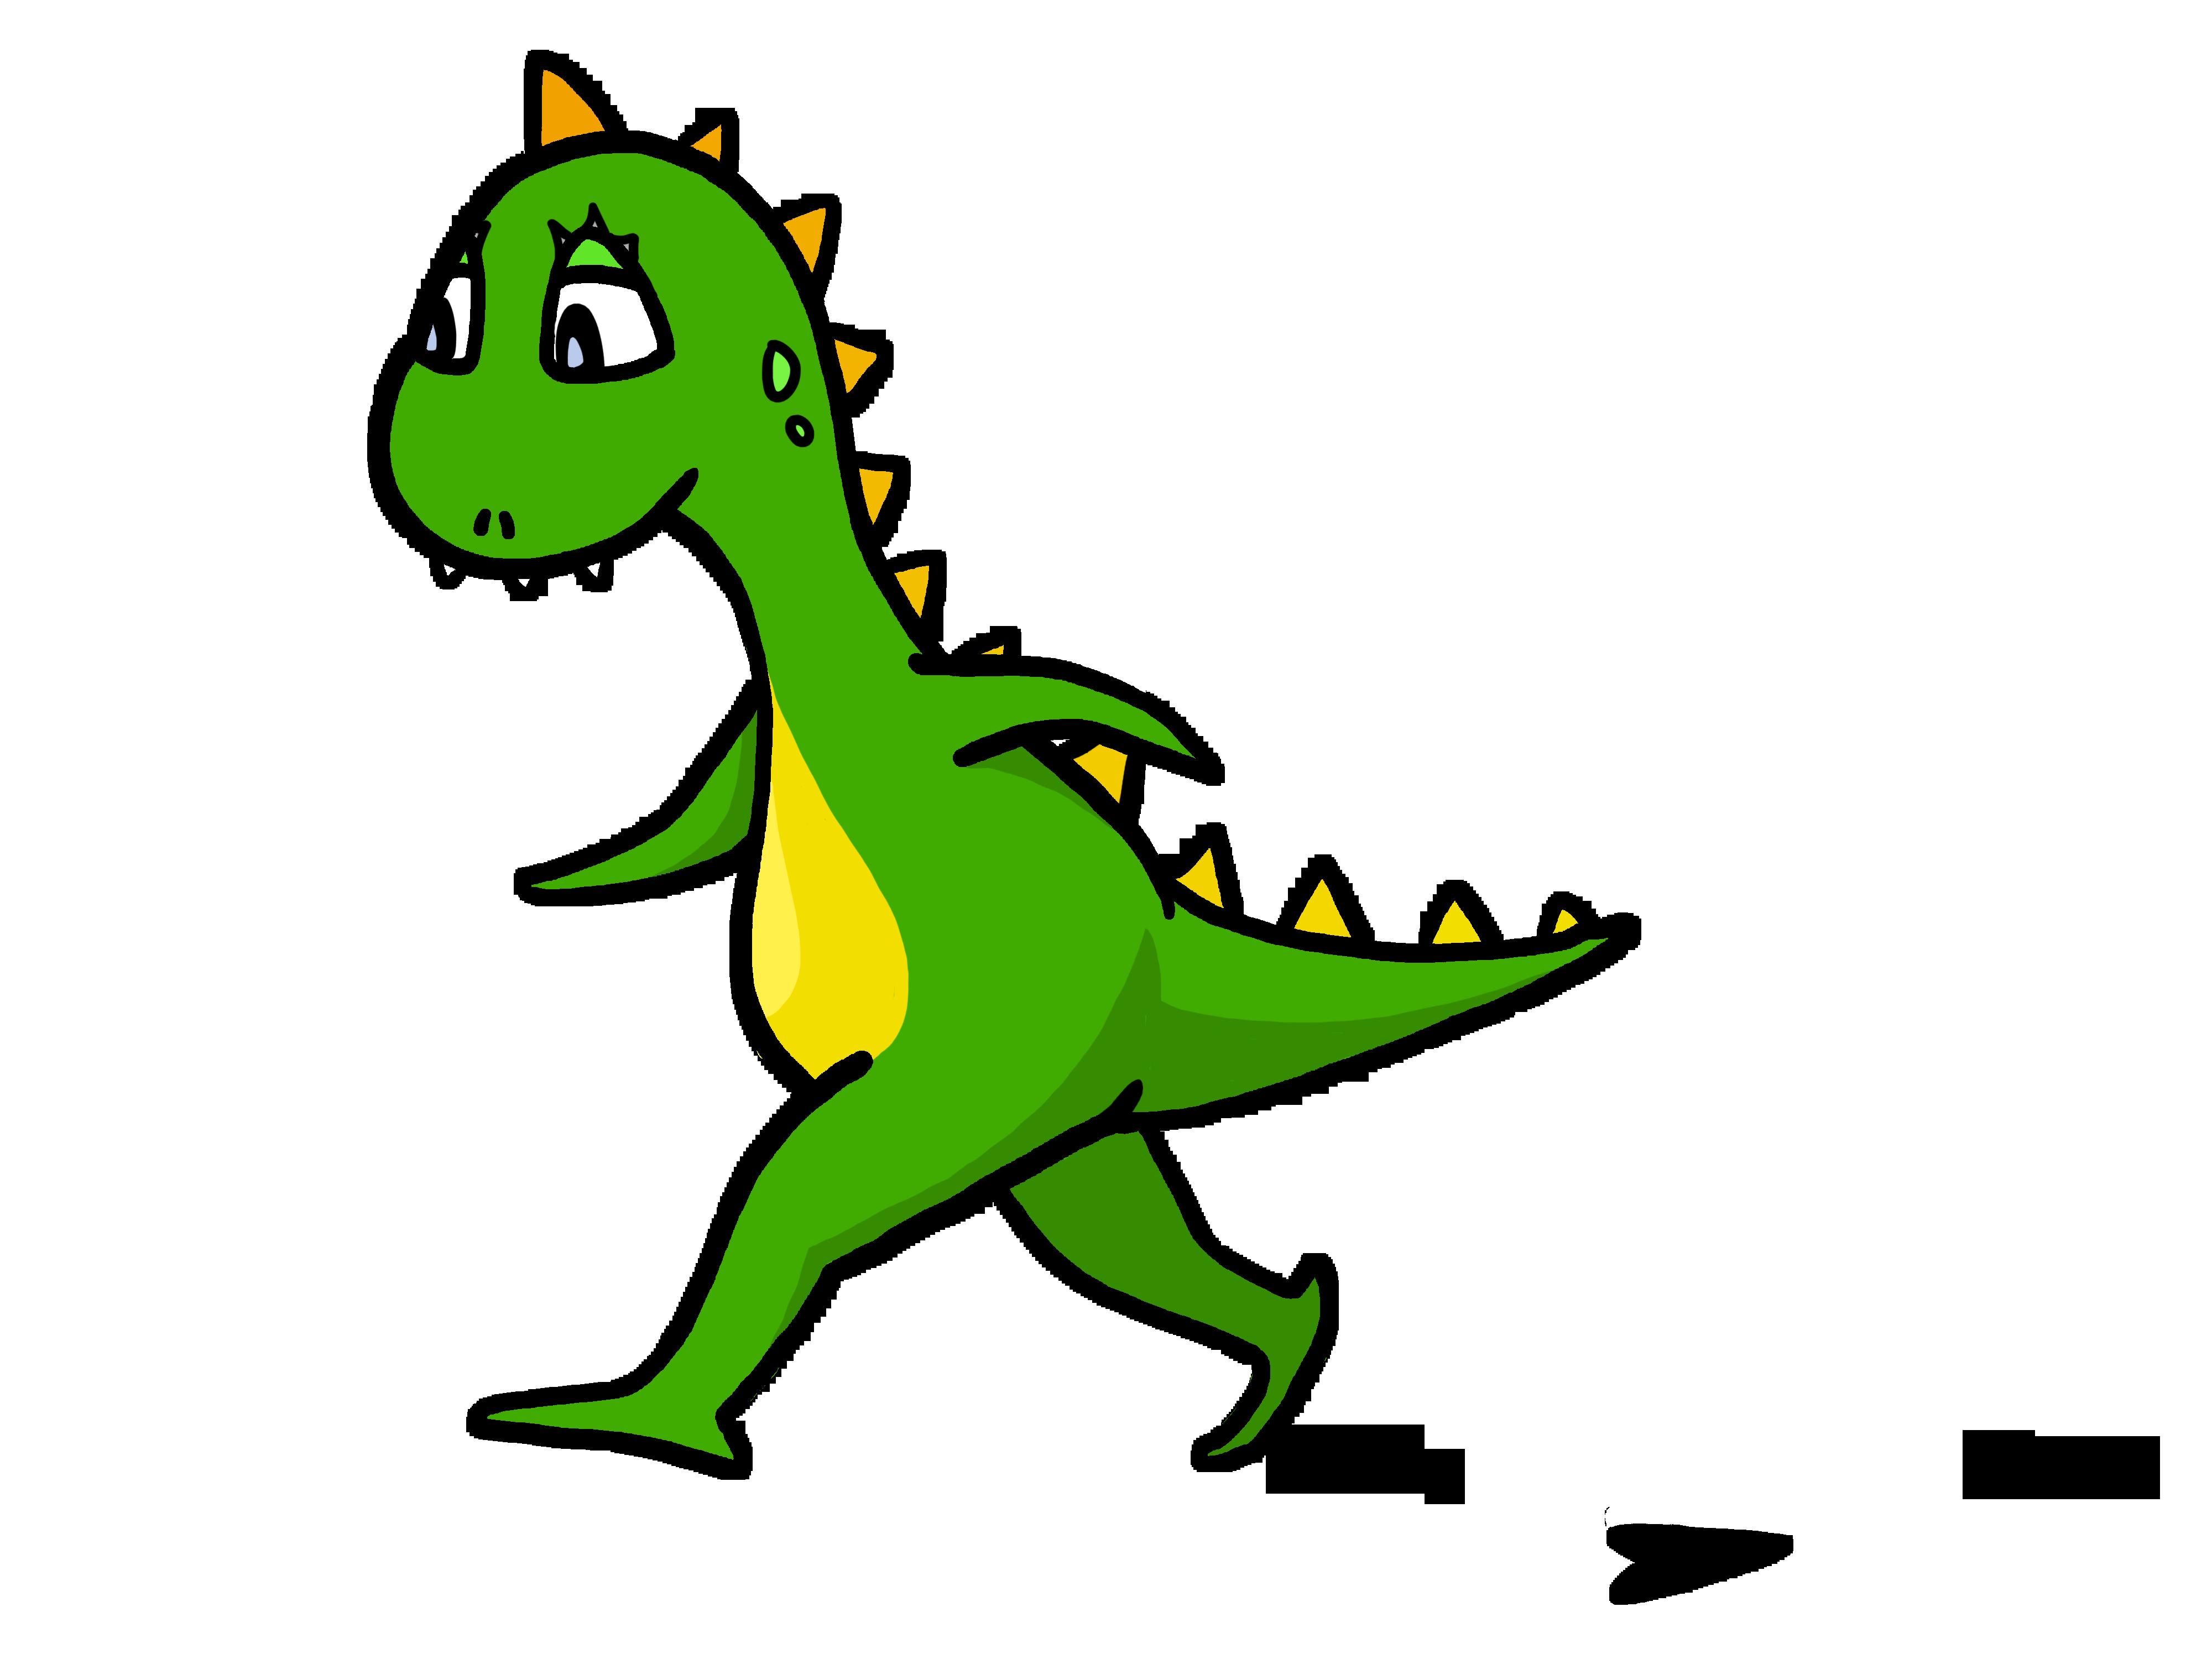 Funny walking free image. Foods clipart dinosaur